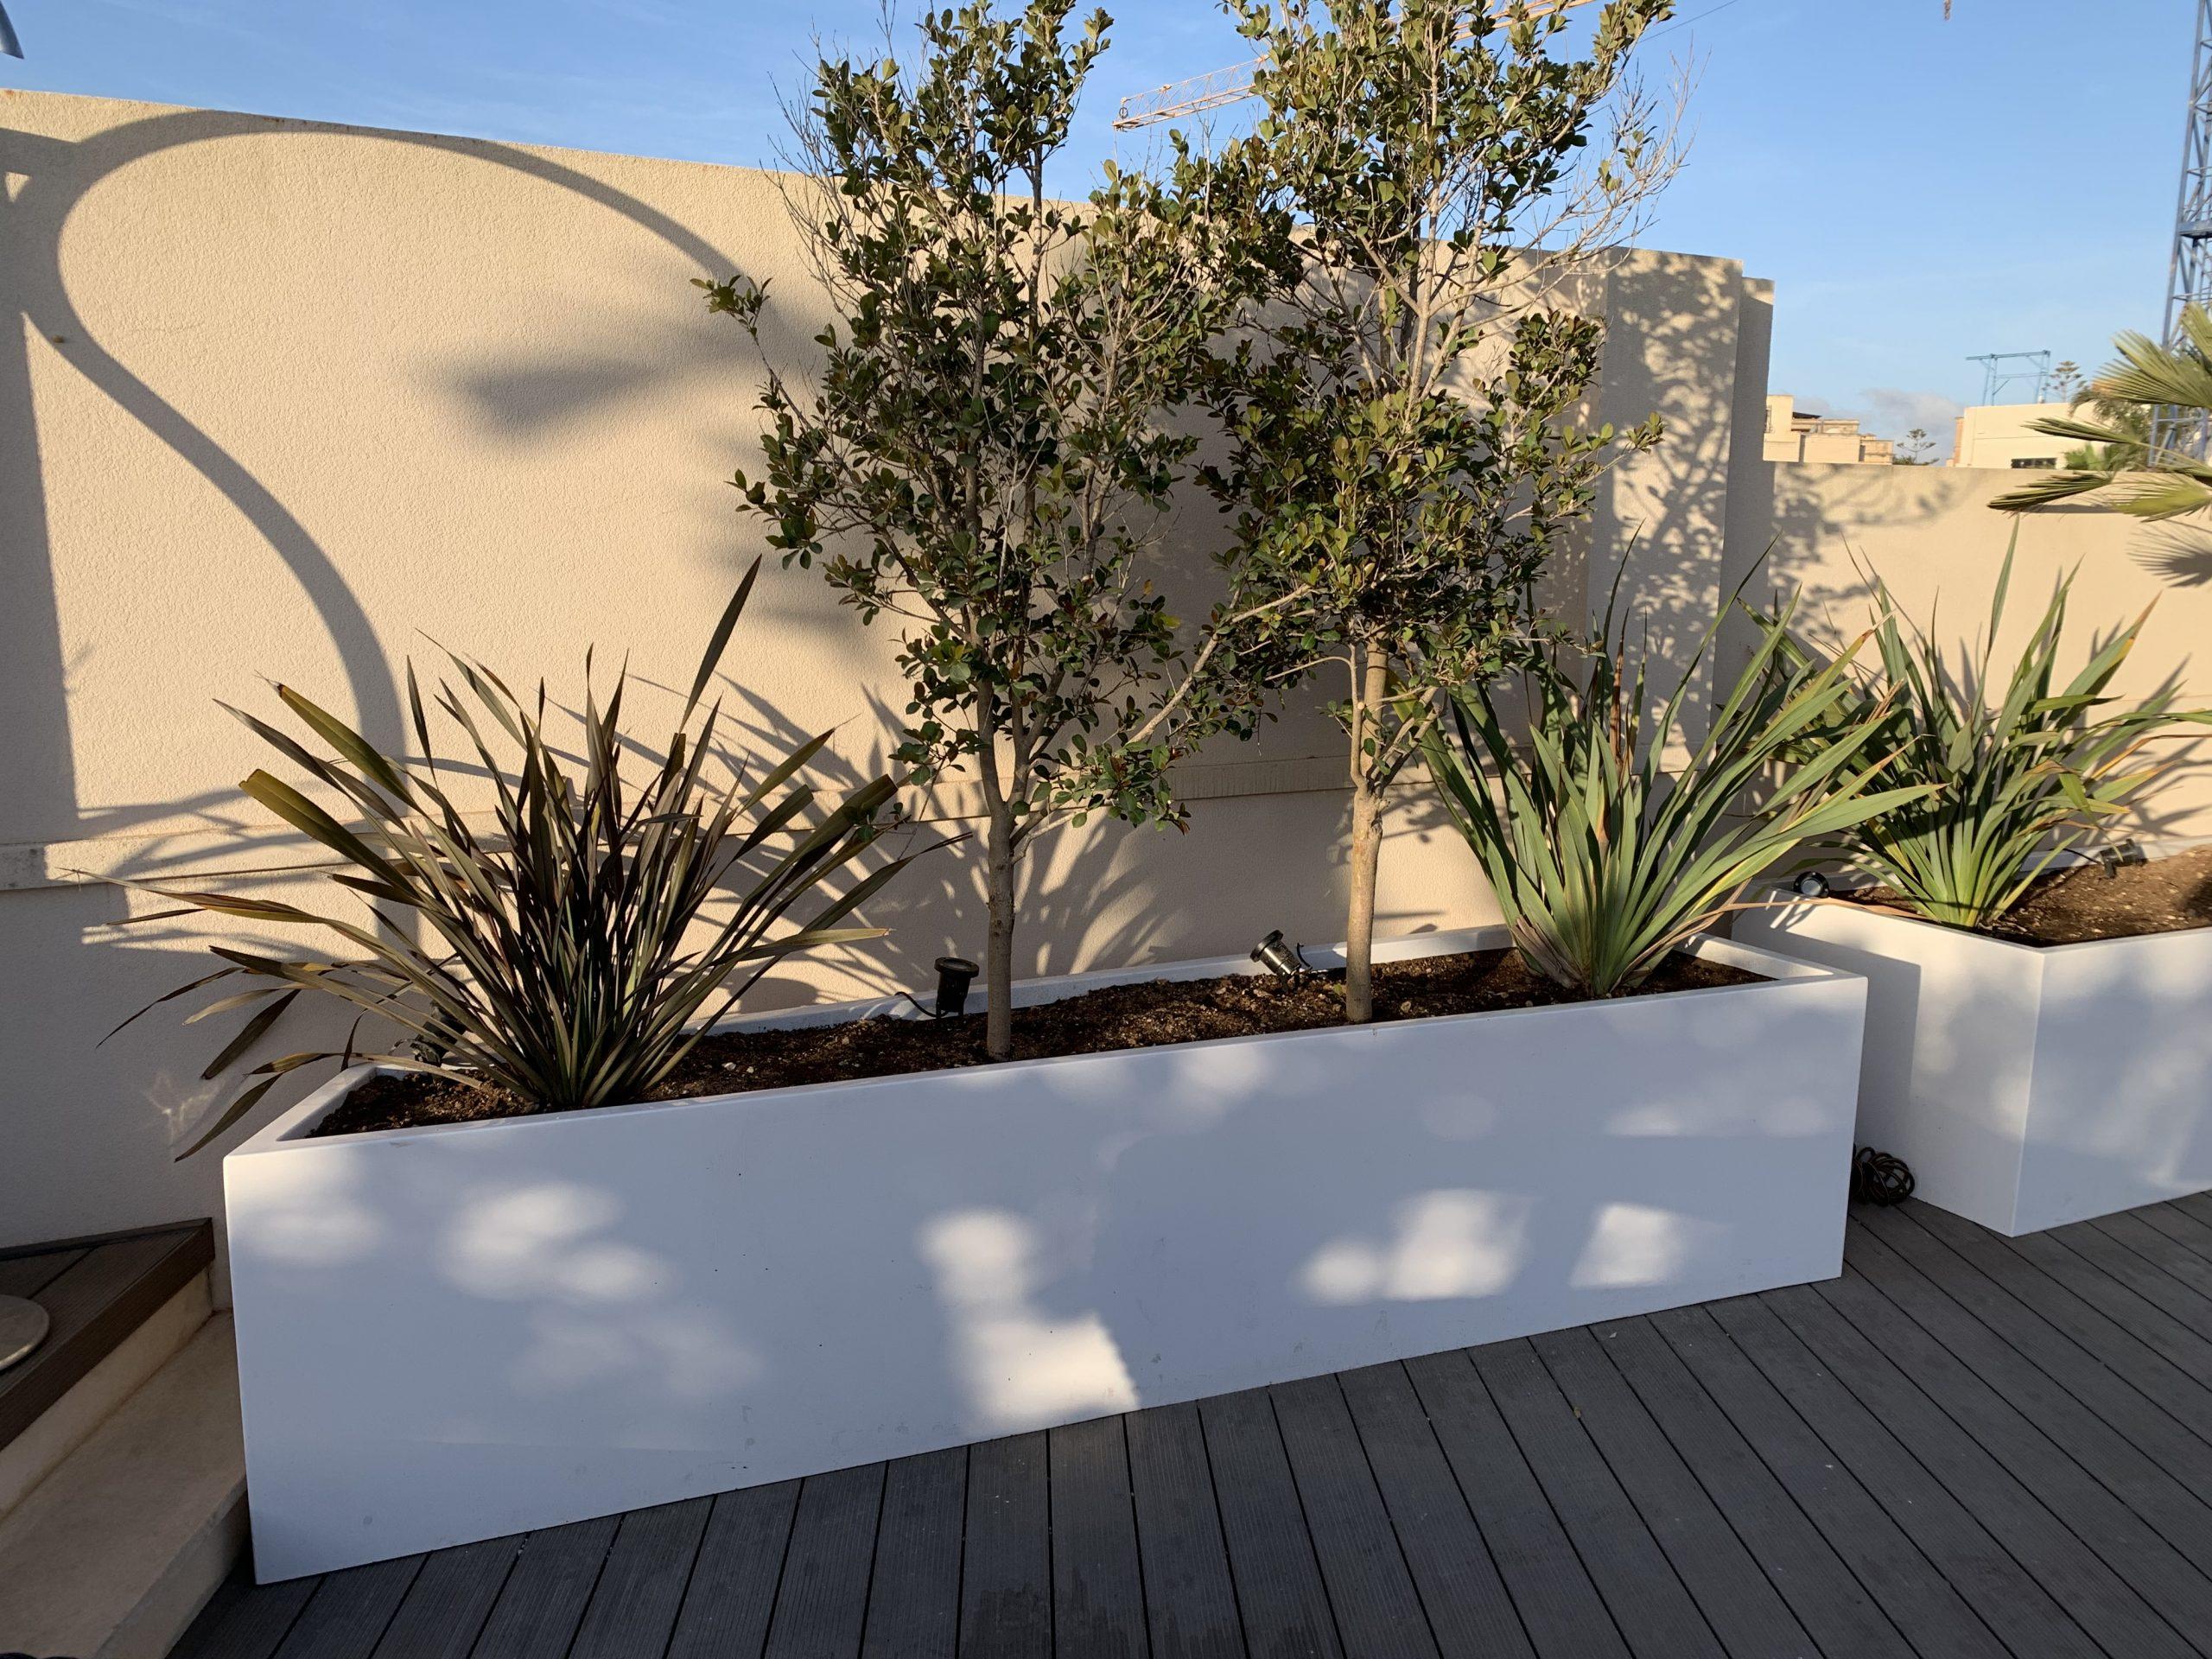 Planter / Trough